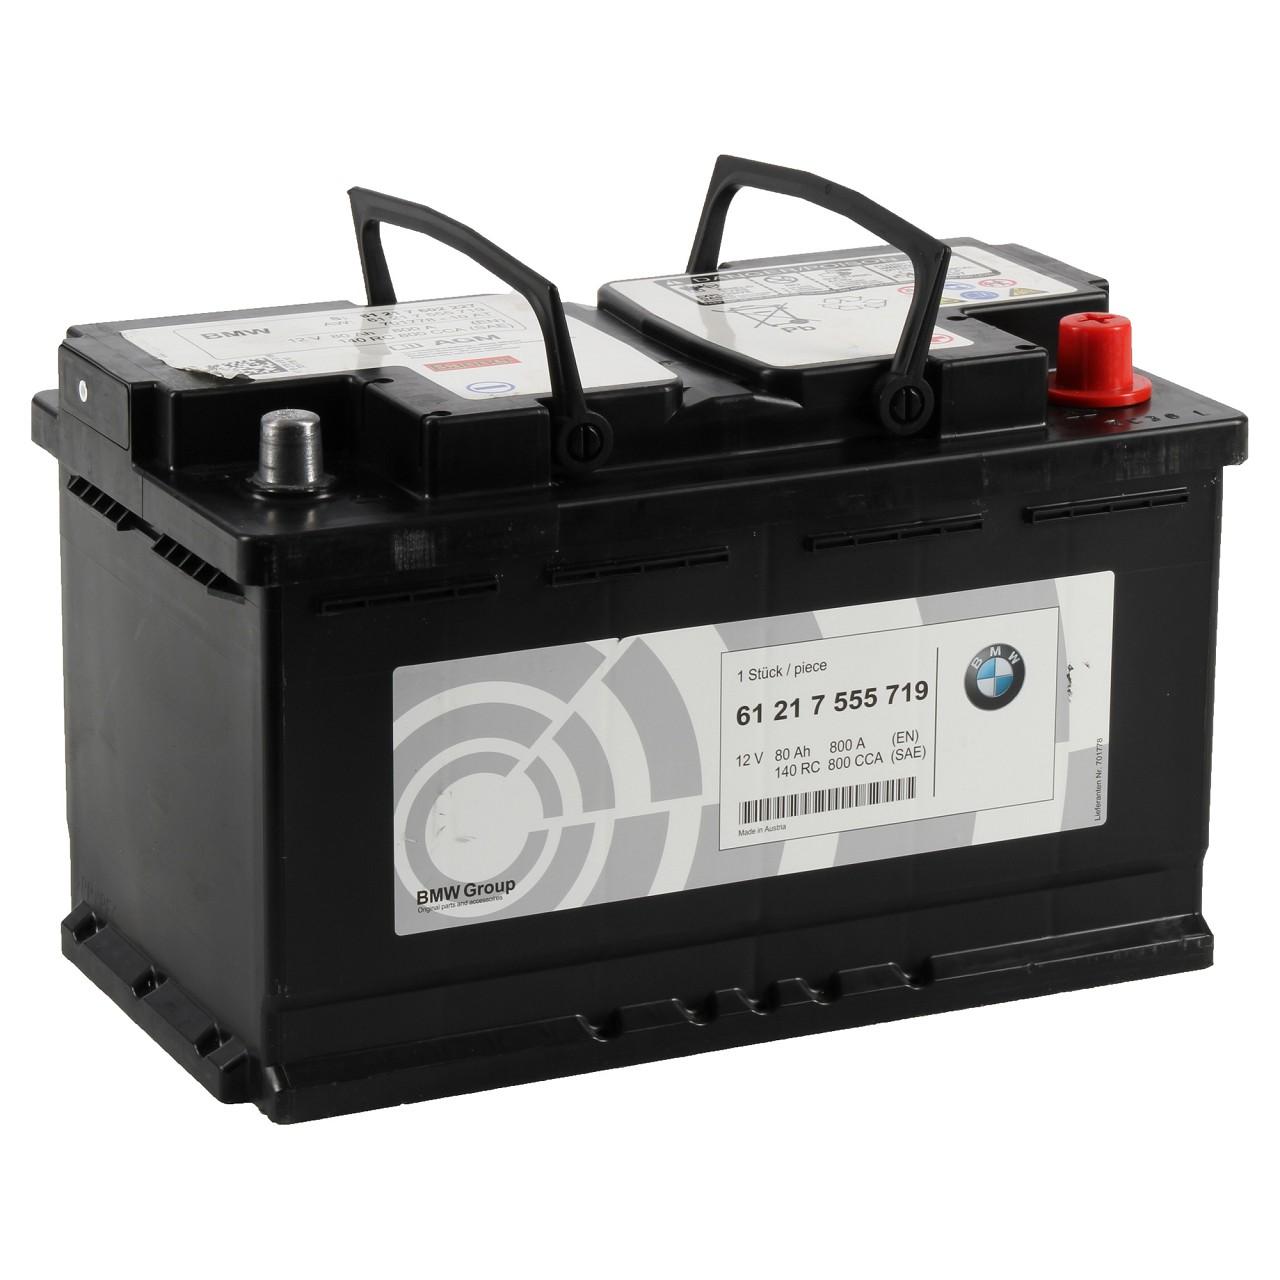 ORIGINAL BMW Autobatterie Batterie Starterbatterie 12V 80Ah 800A 61217555719